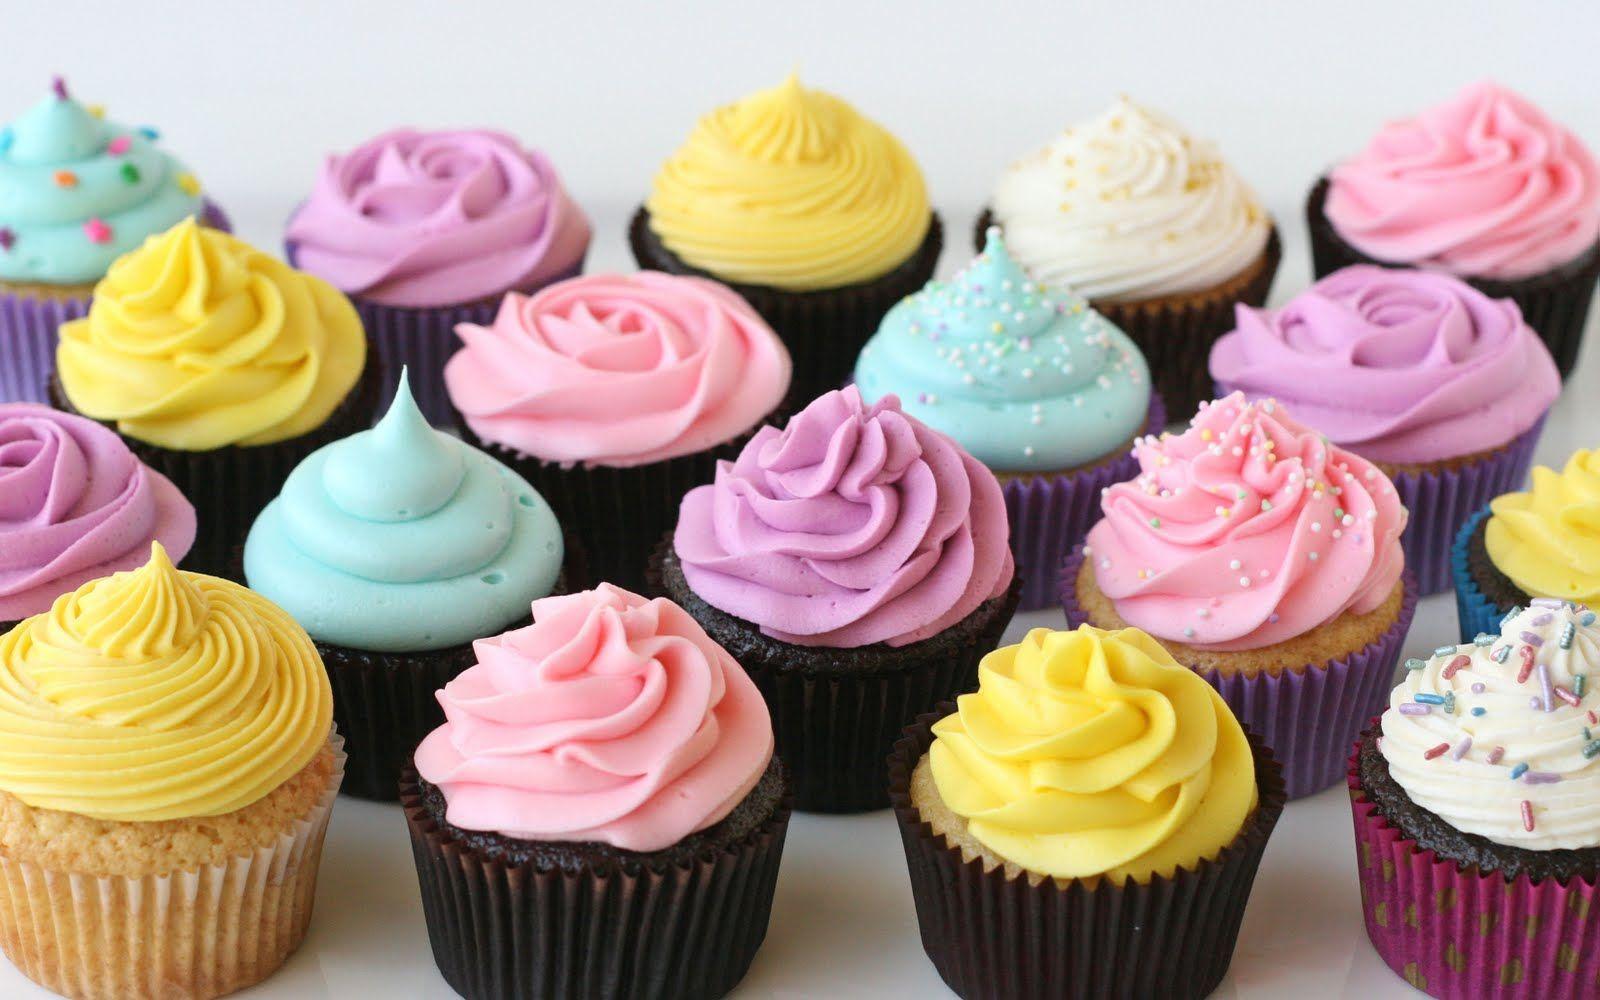 pics of cupcakes